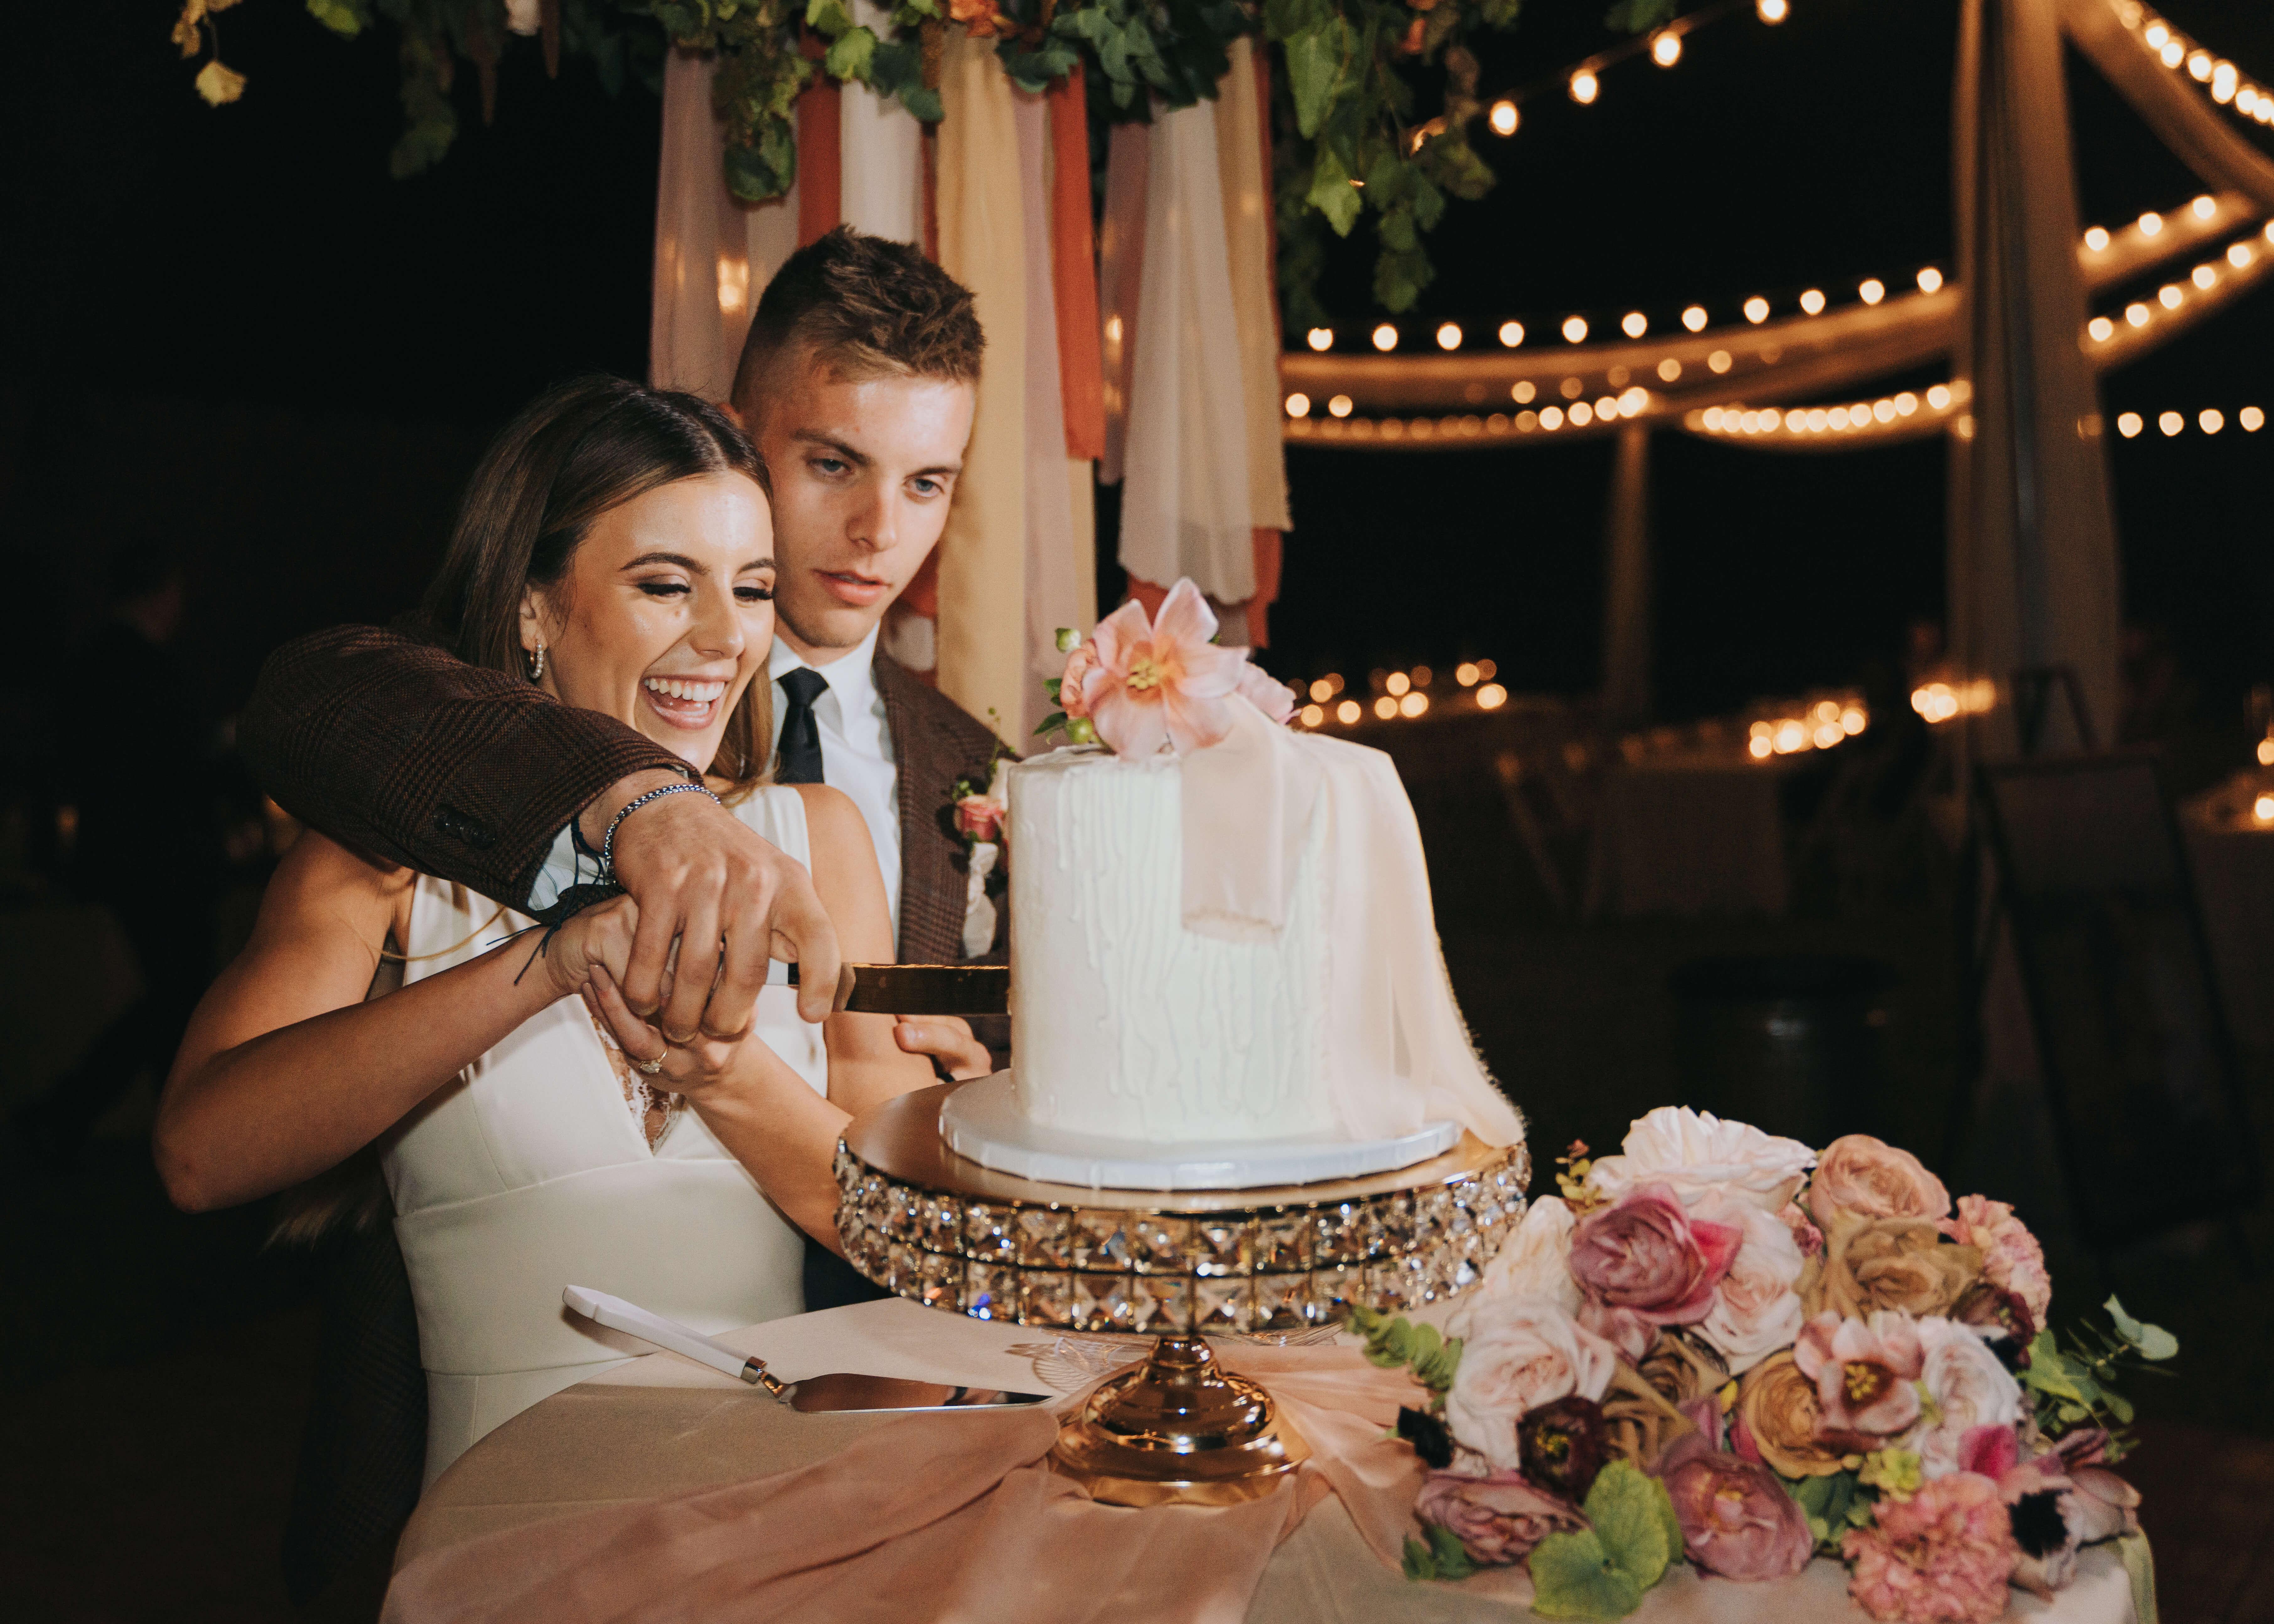 cutting cake wedding photo